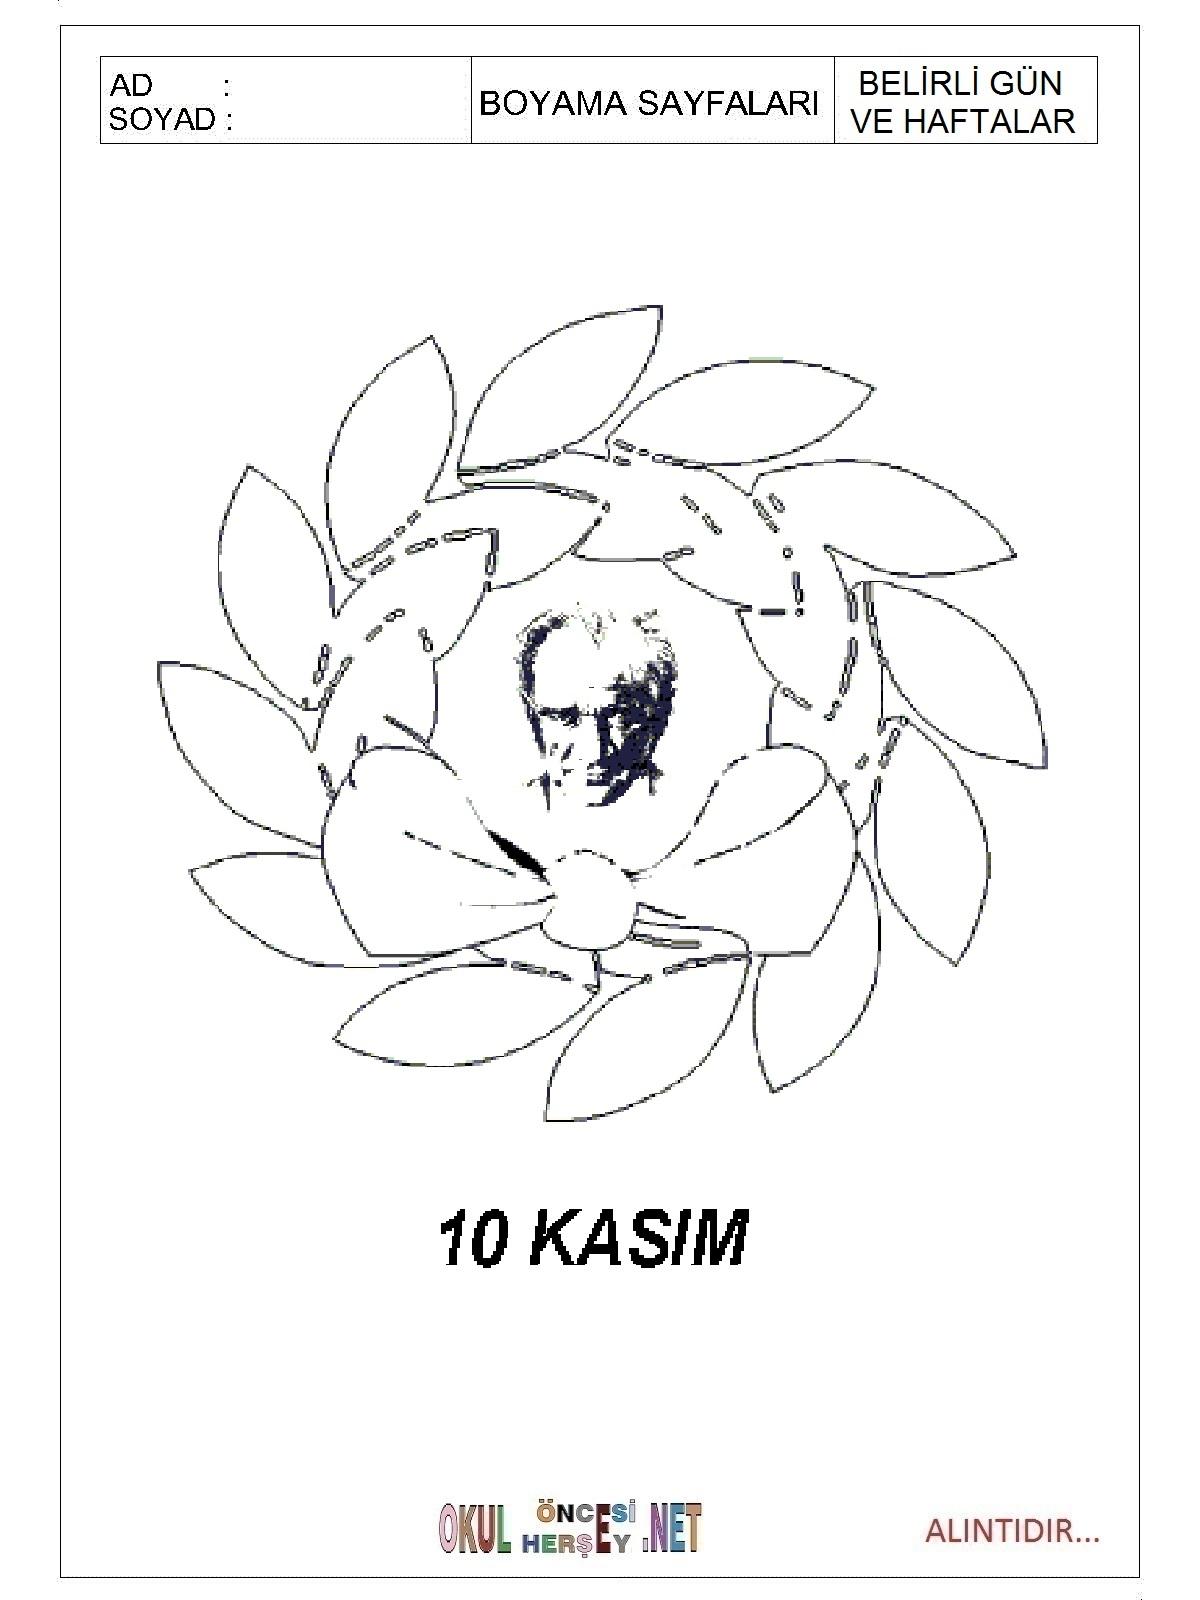 10 Kasim Boyama Sayfalari